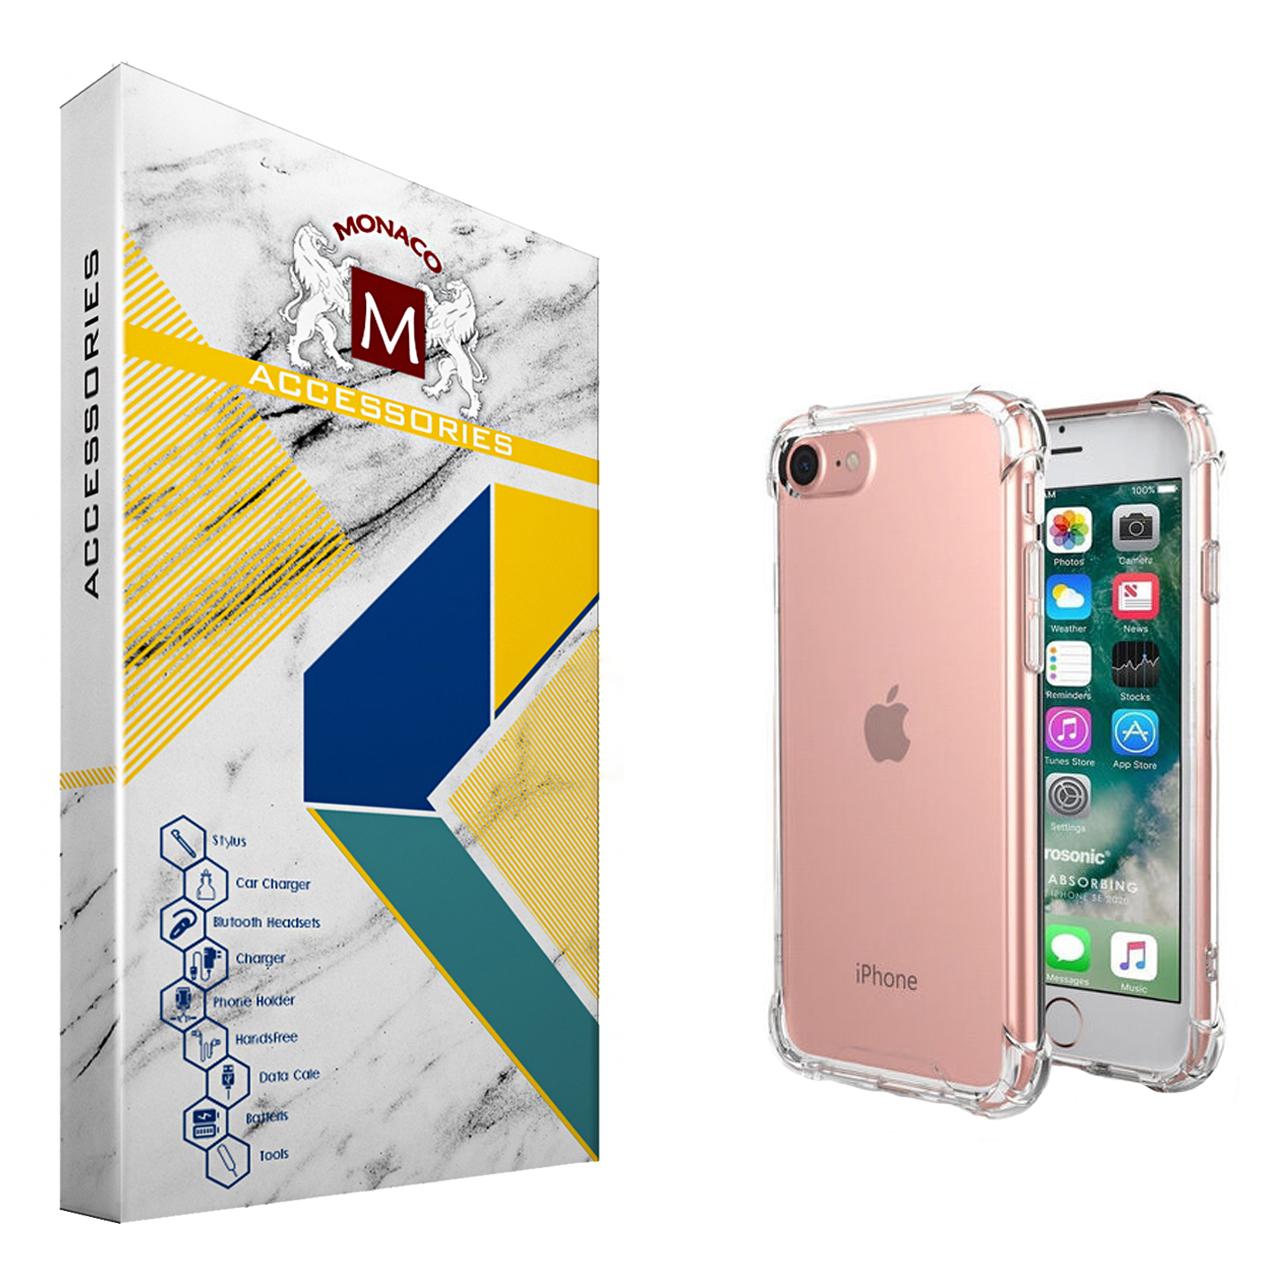 کاور موناکو مدل Shine مناسب برای گوشی موبایل اپل iPhone SE 2020